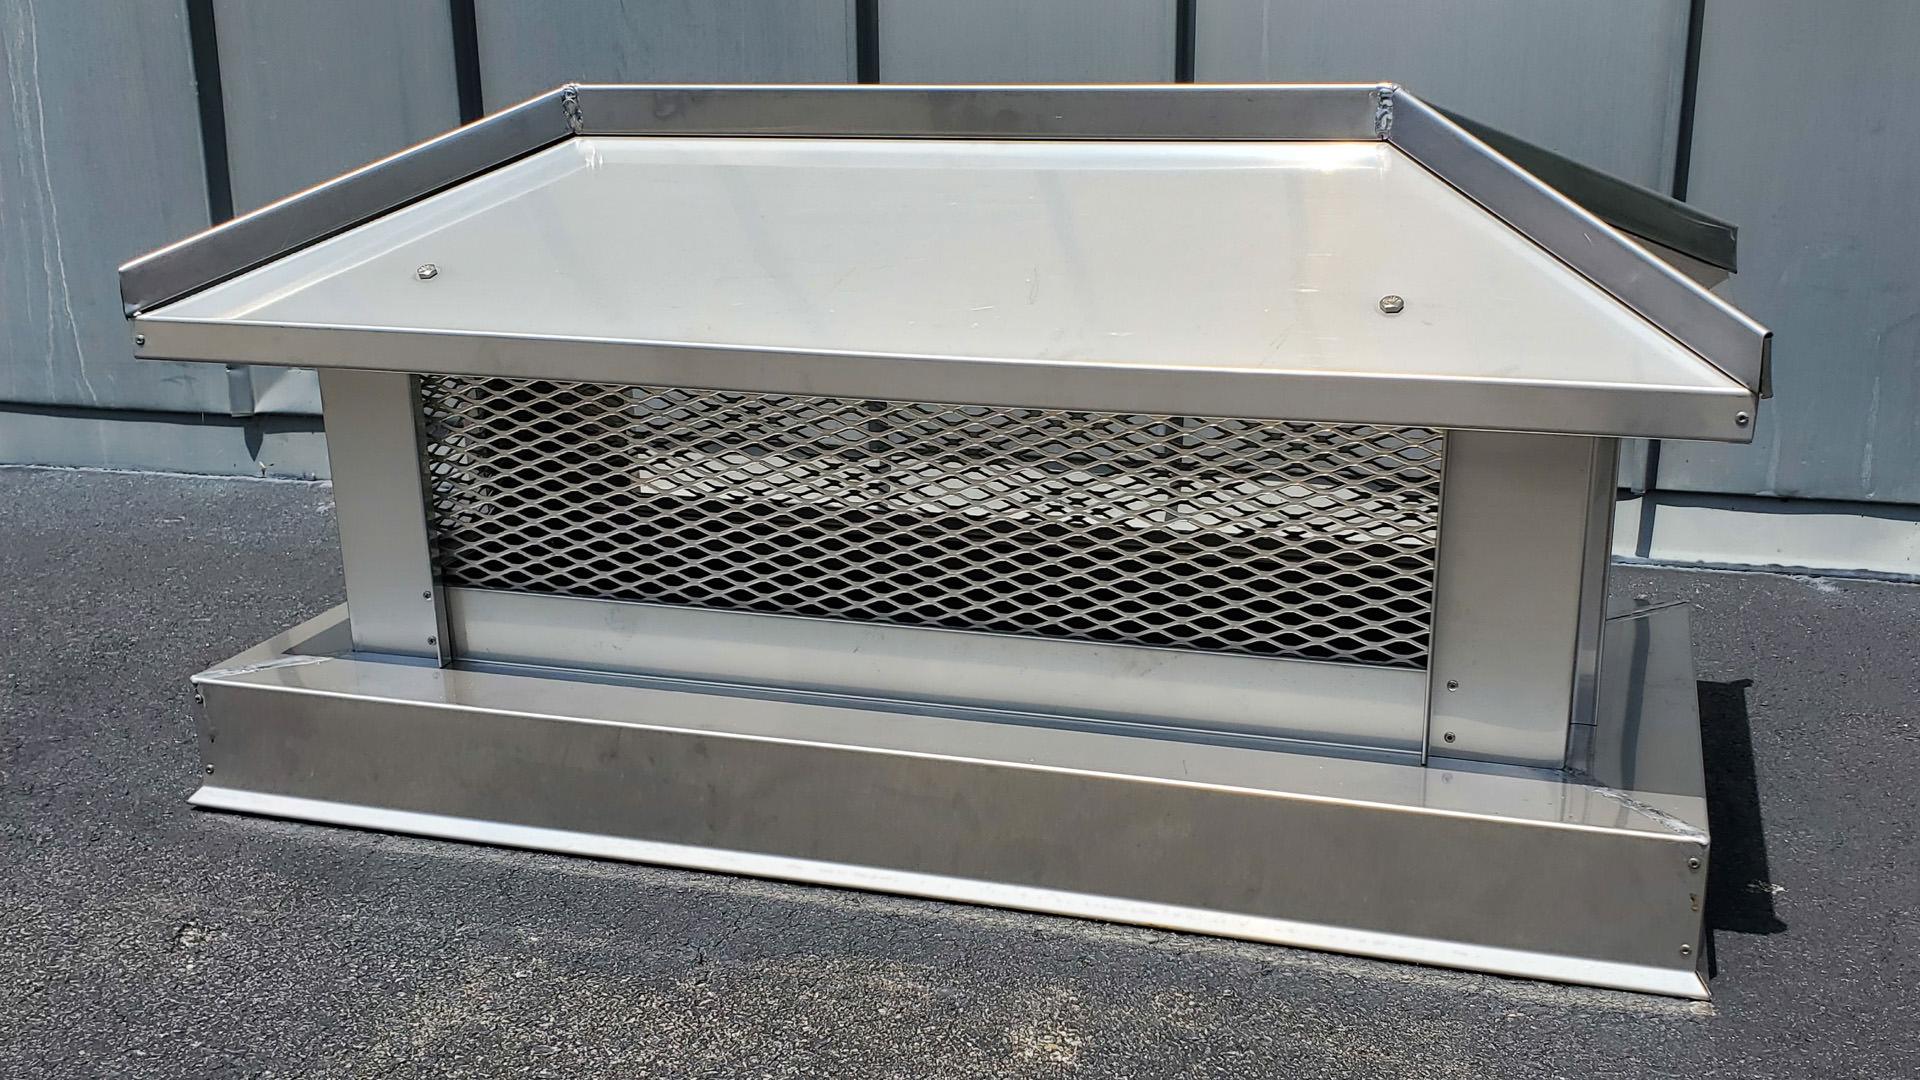 CC103 - stainless steel hip and ridge metal chimney cap